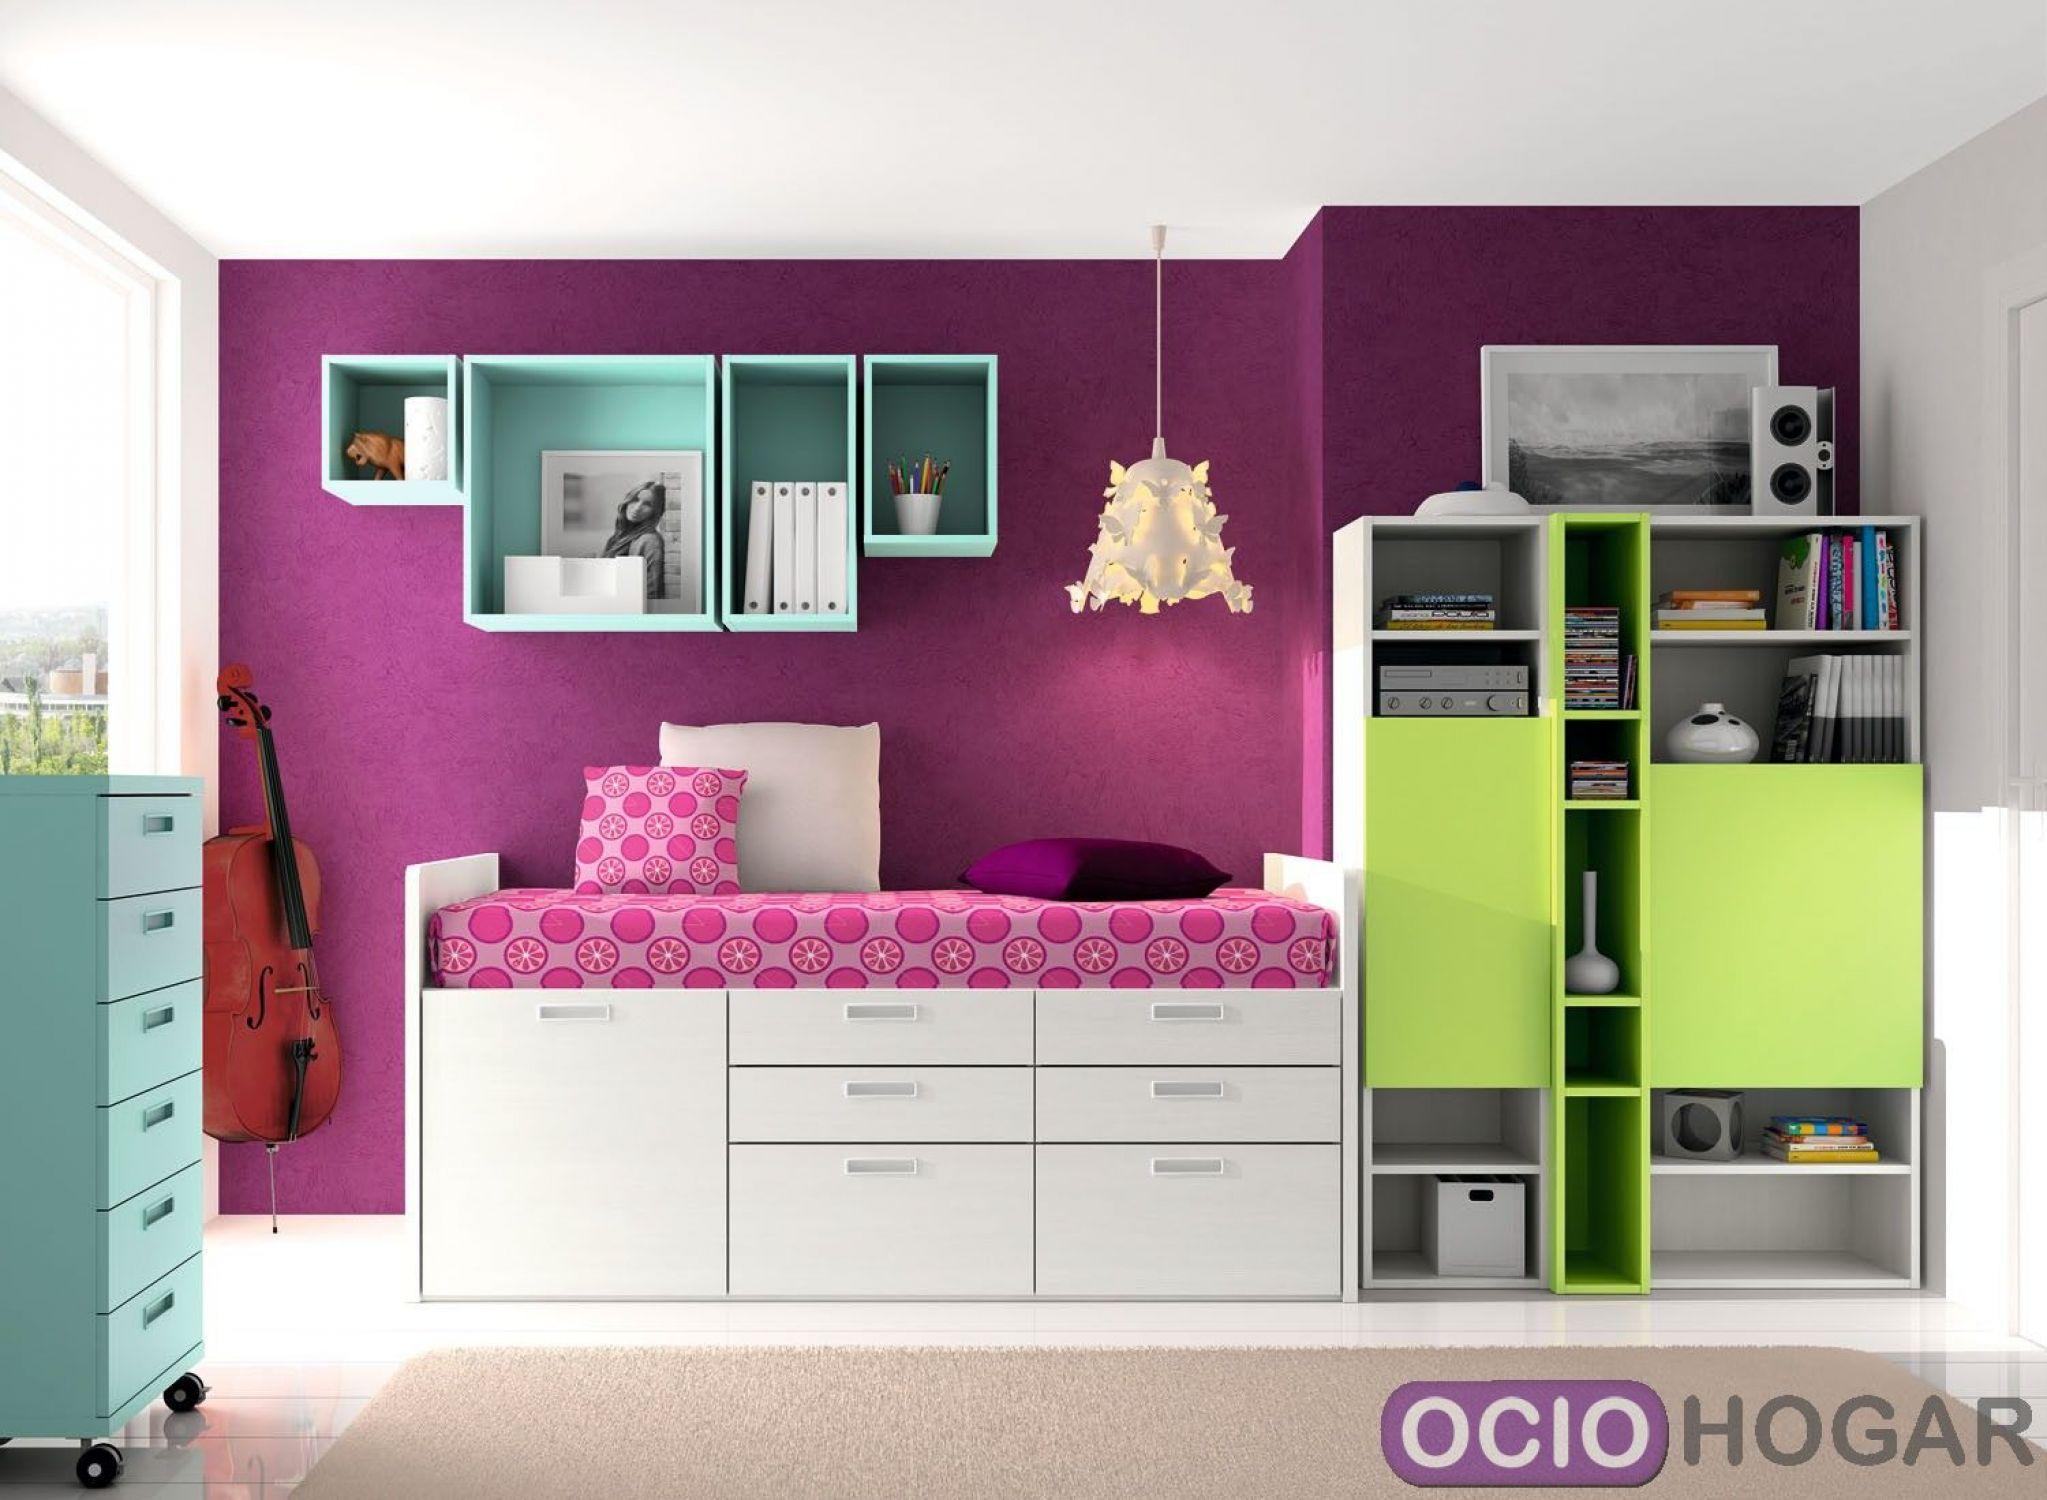 Dormitorio Juvenil Spacios De Dissery Muebles Modernos